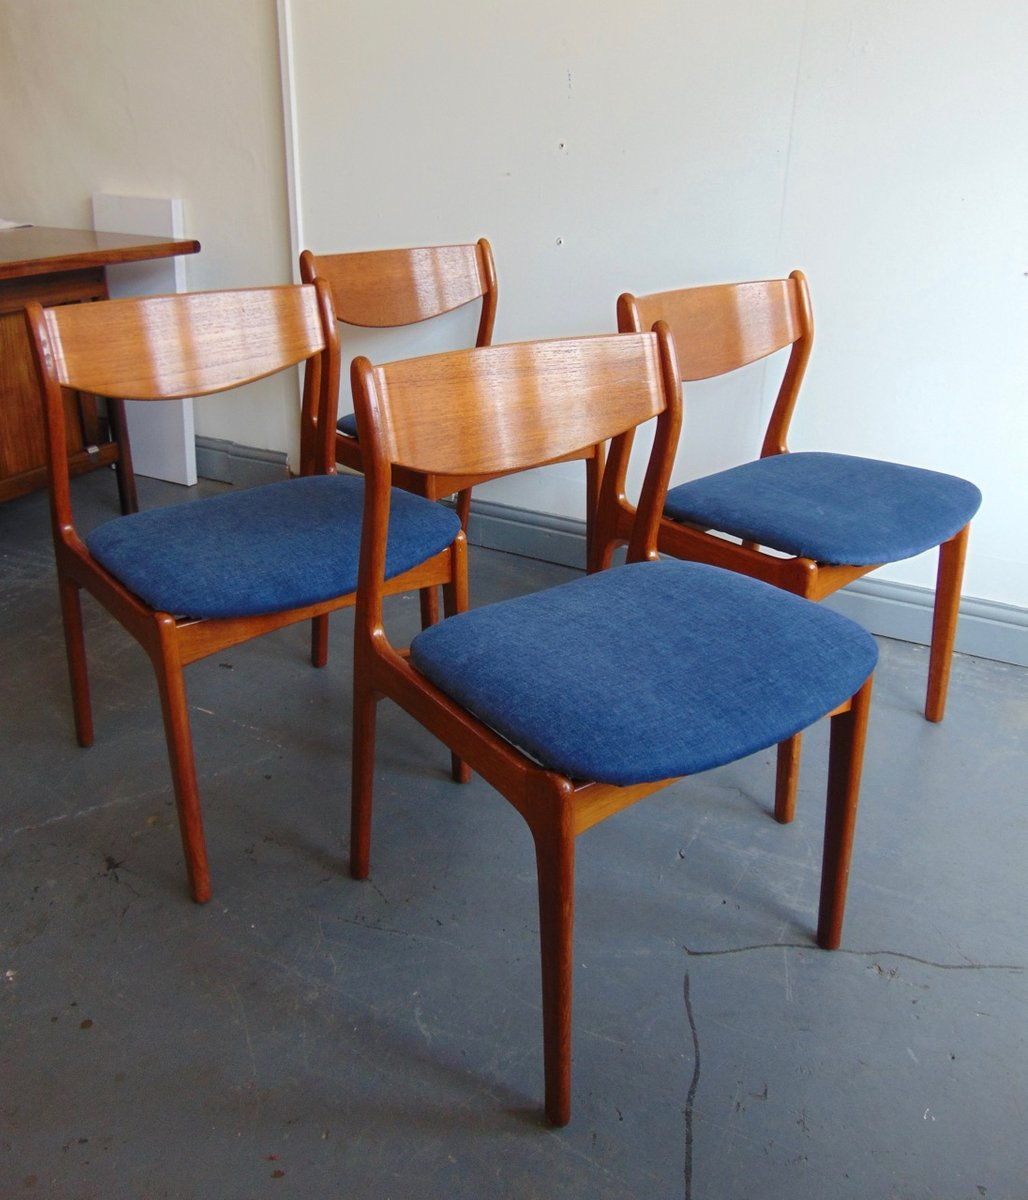 vintage teak dining chairs by pe jorgensen for farso stolefabrik set of 4